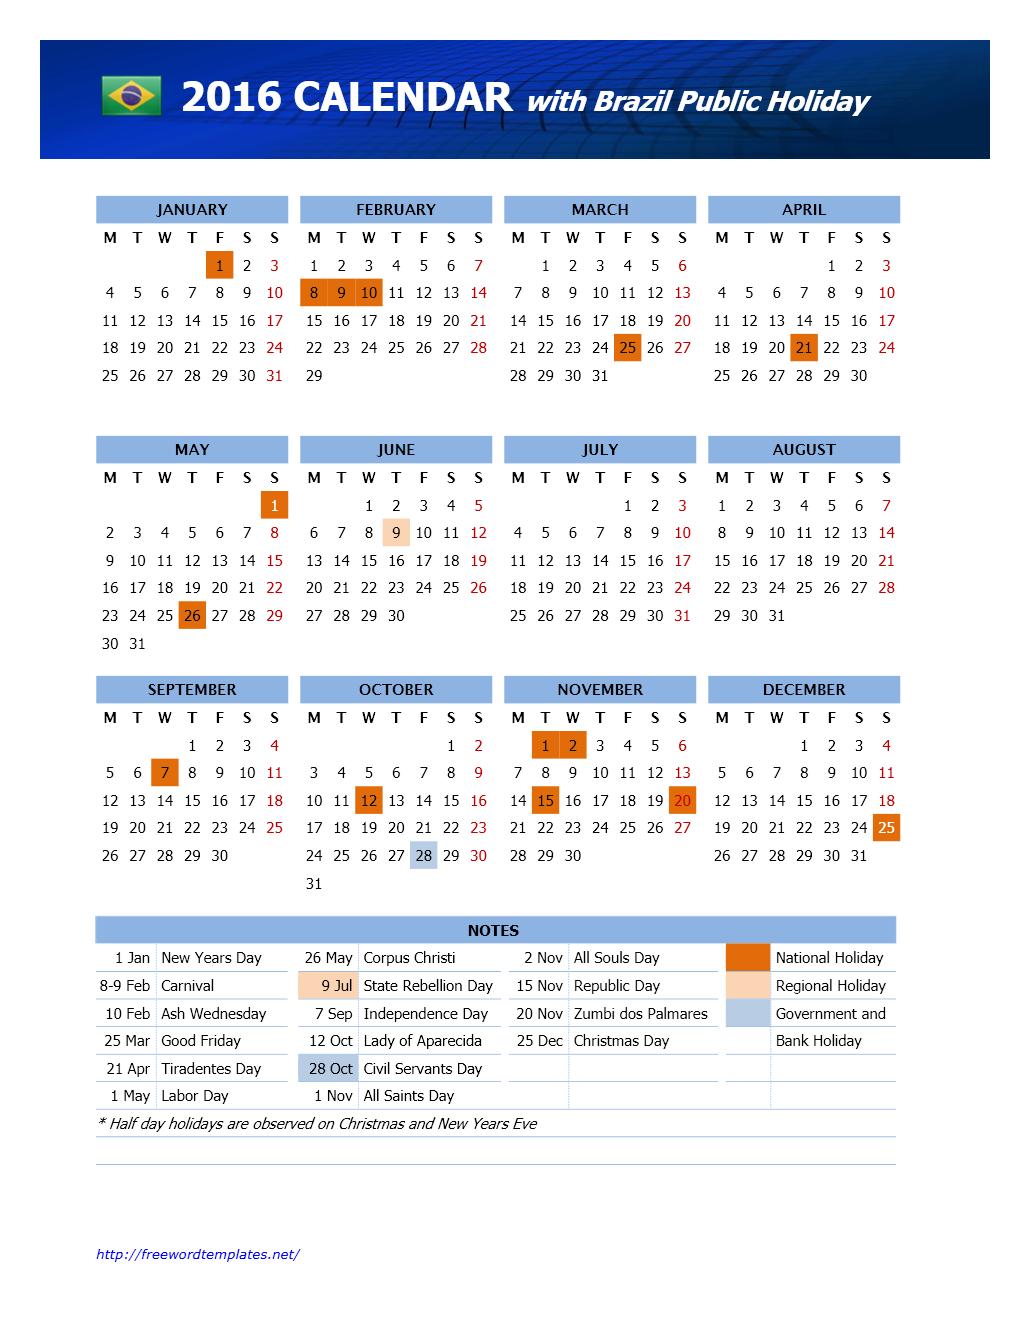 2016 Brazil Public Holidays Calendar